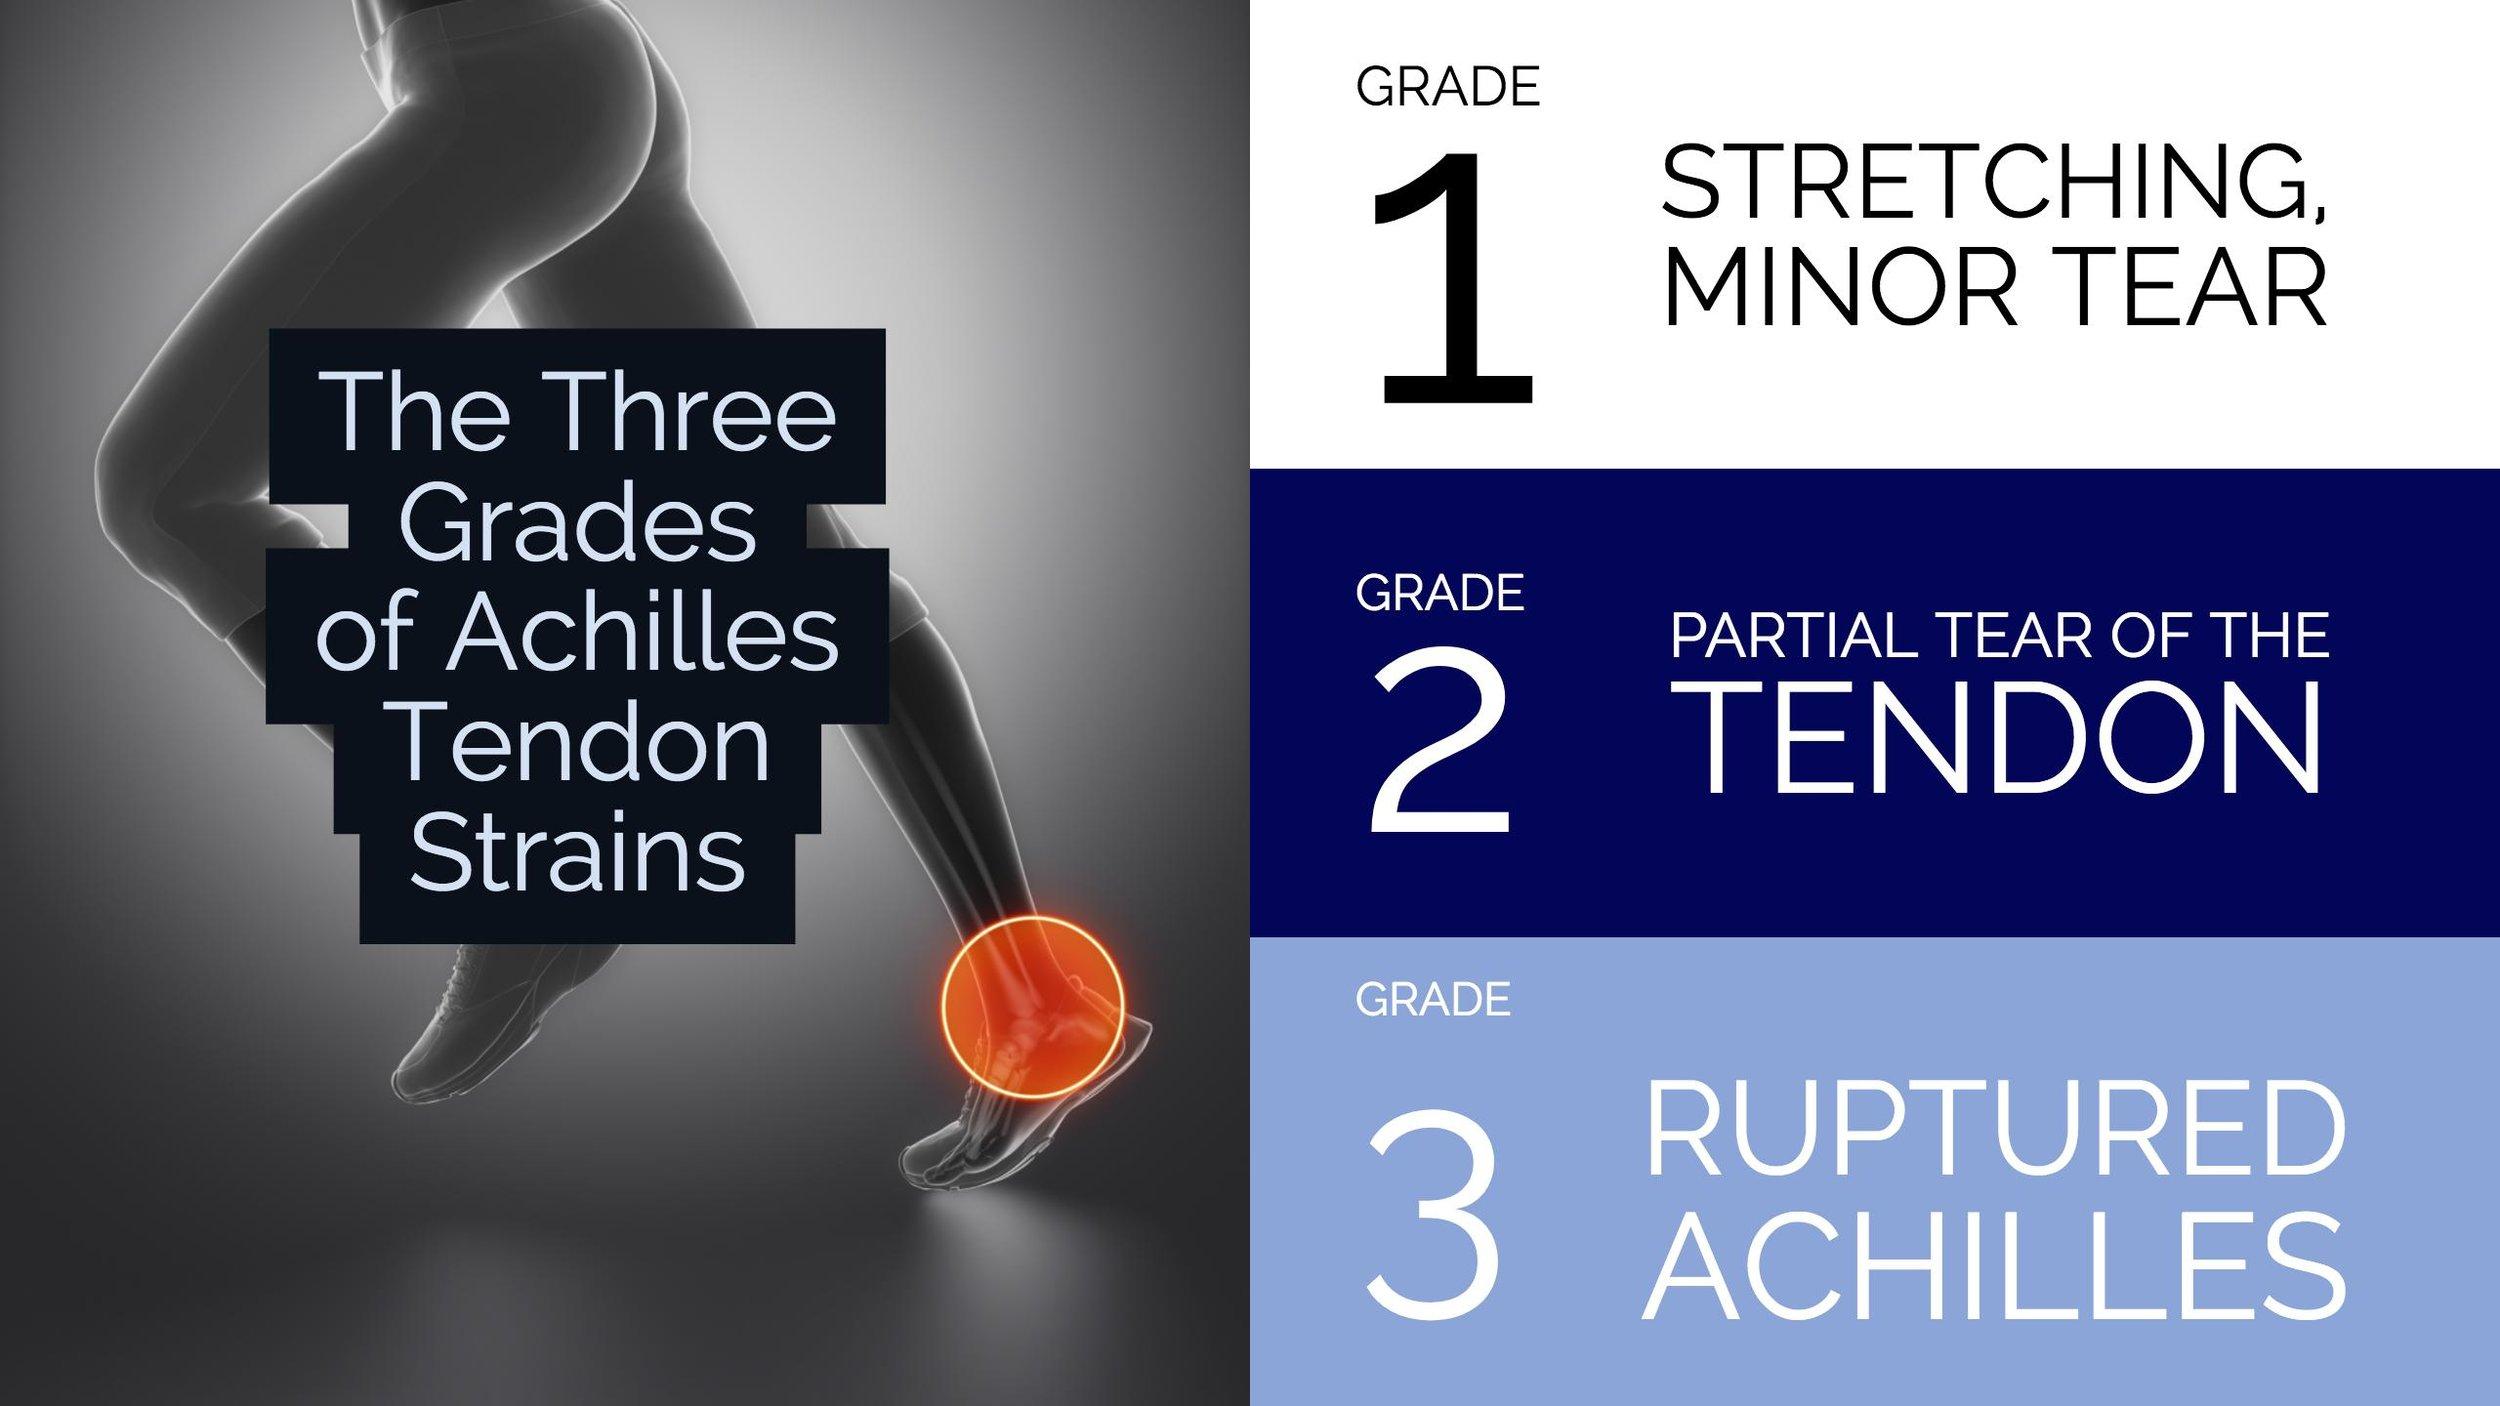 The Three Grades of Achilles Tendon Strains